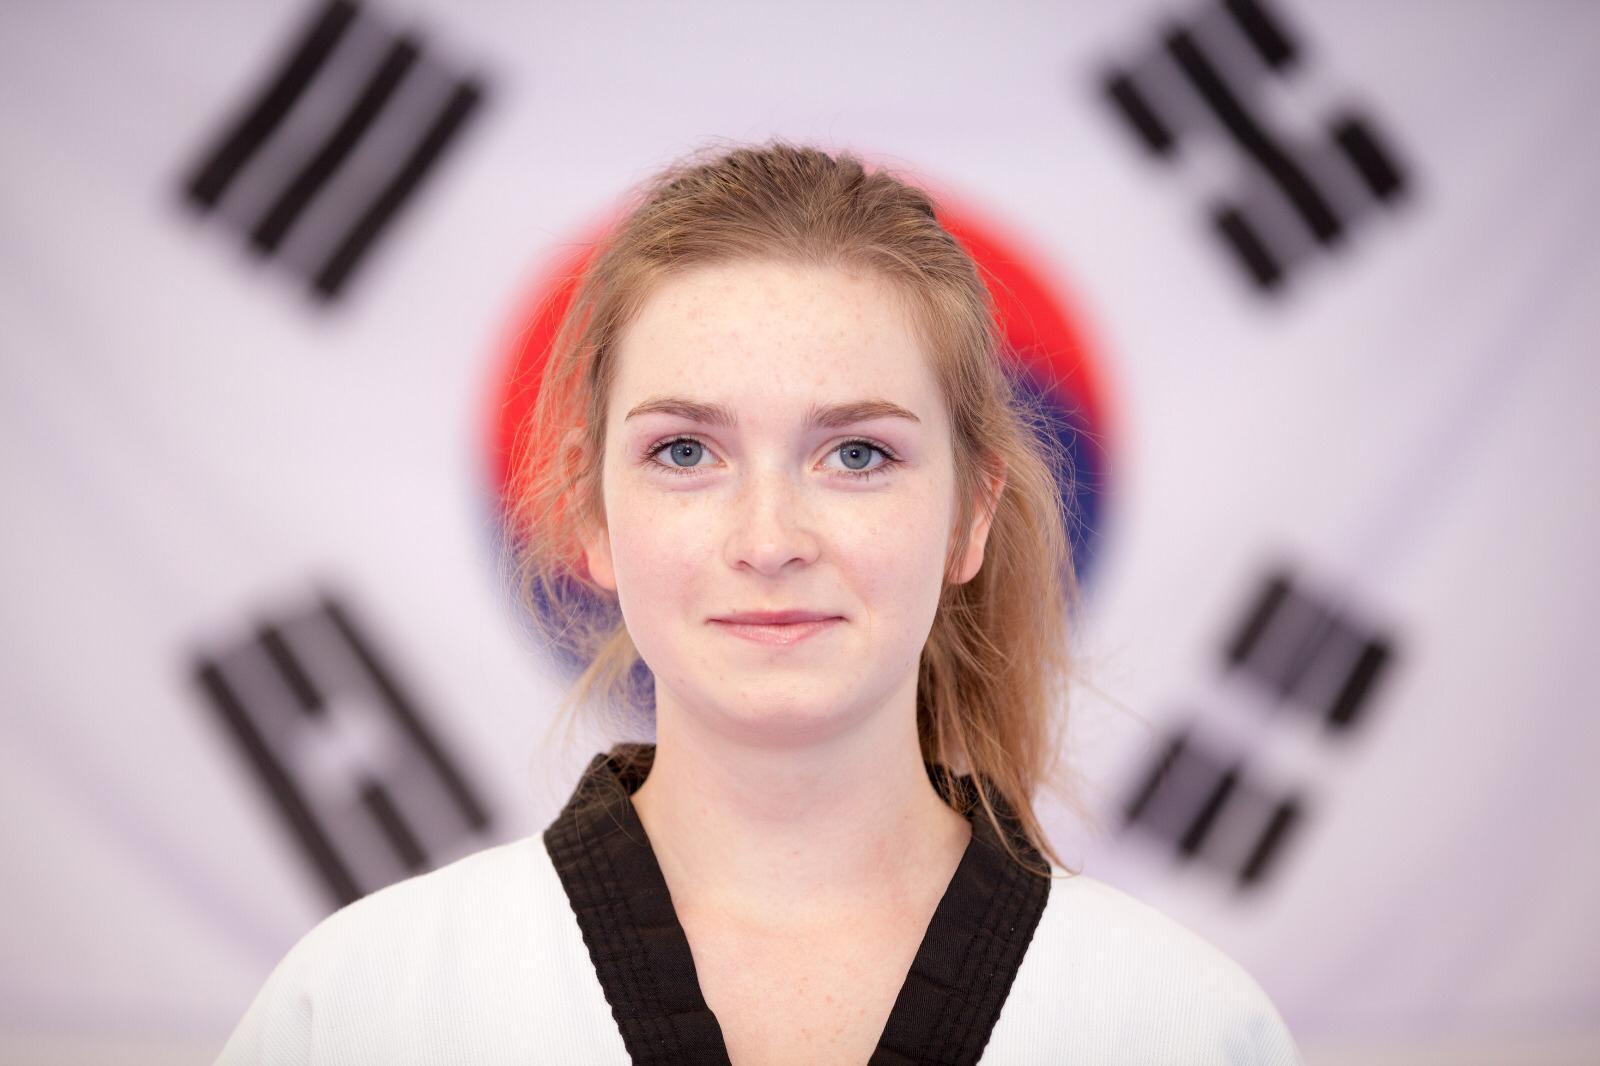 Chiara Kleemann